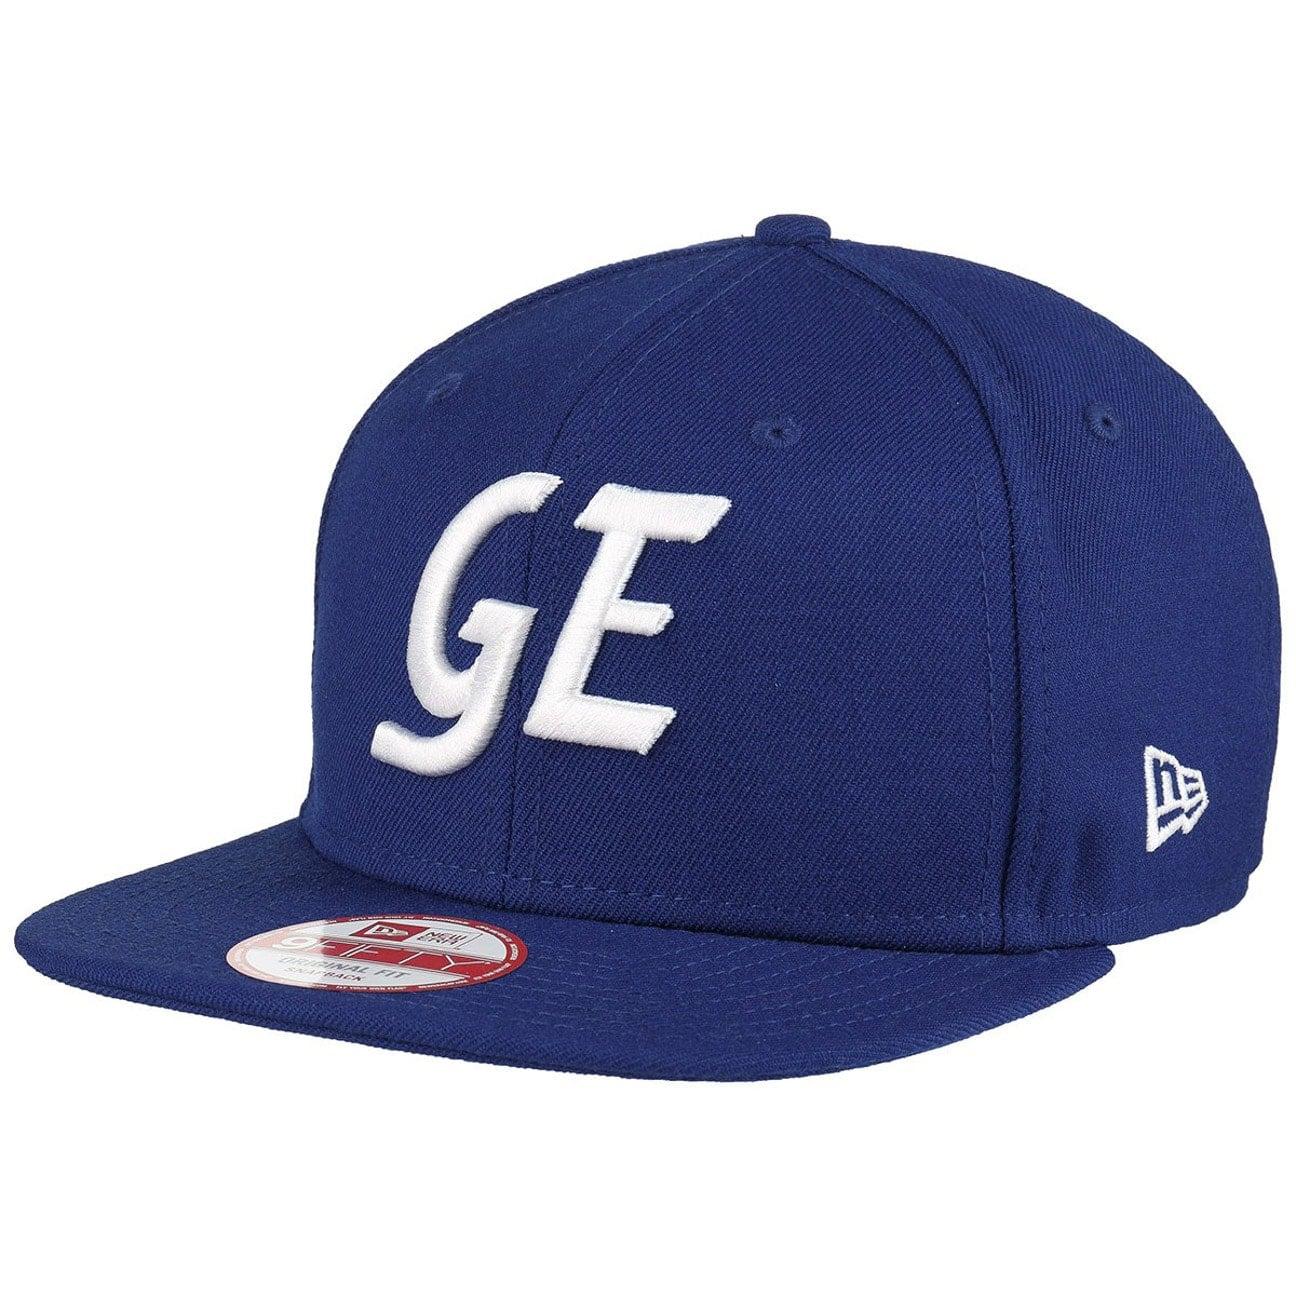 c9cea16bc282c ... order ge snapback cap by new era royal blue 3 2c41d 3f993